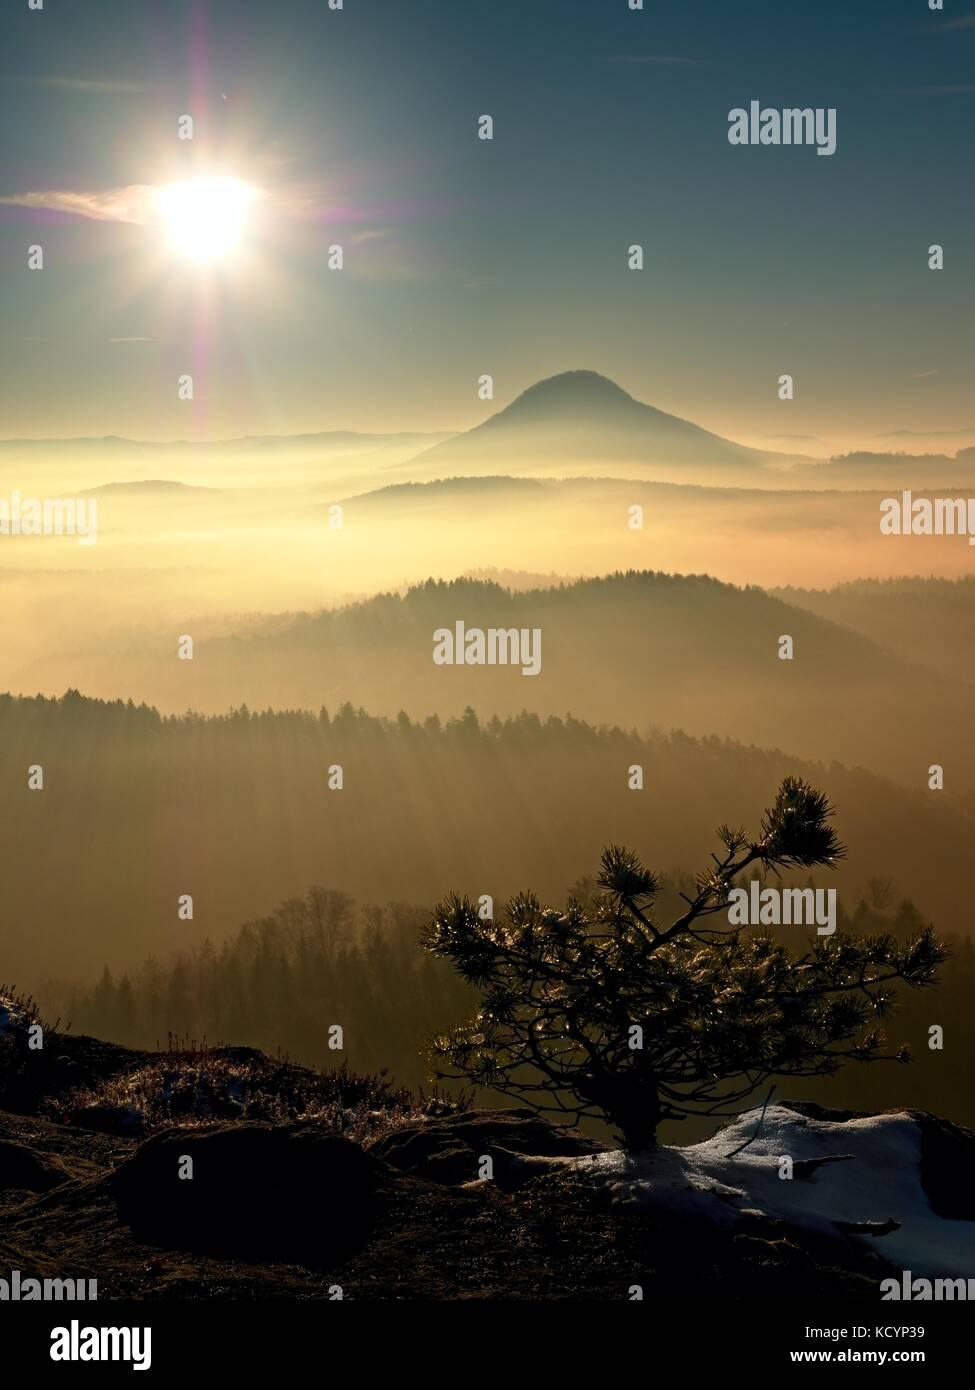 First snow flakes in needles of wild bonsai of pine on sandstone rocks. Blue mist in valley below peak. Autumnal - Stock Image